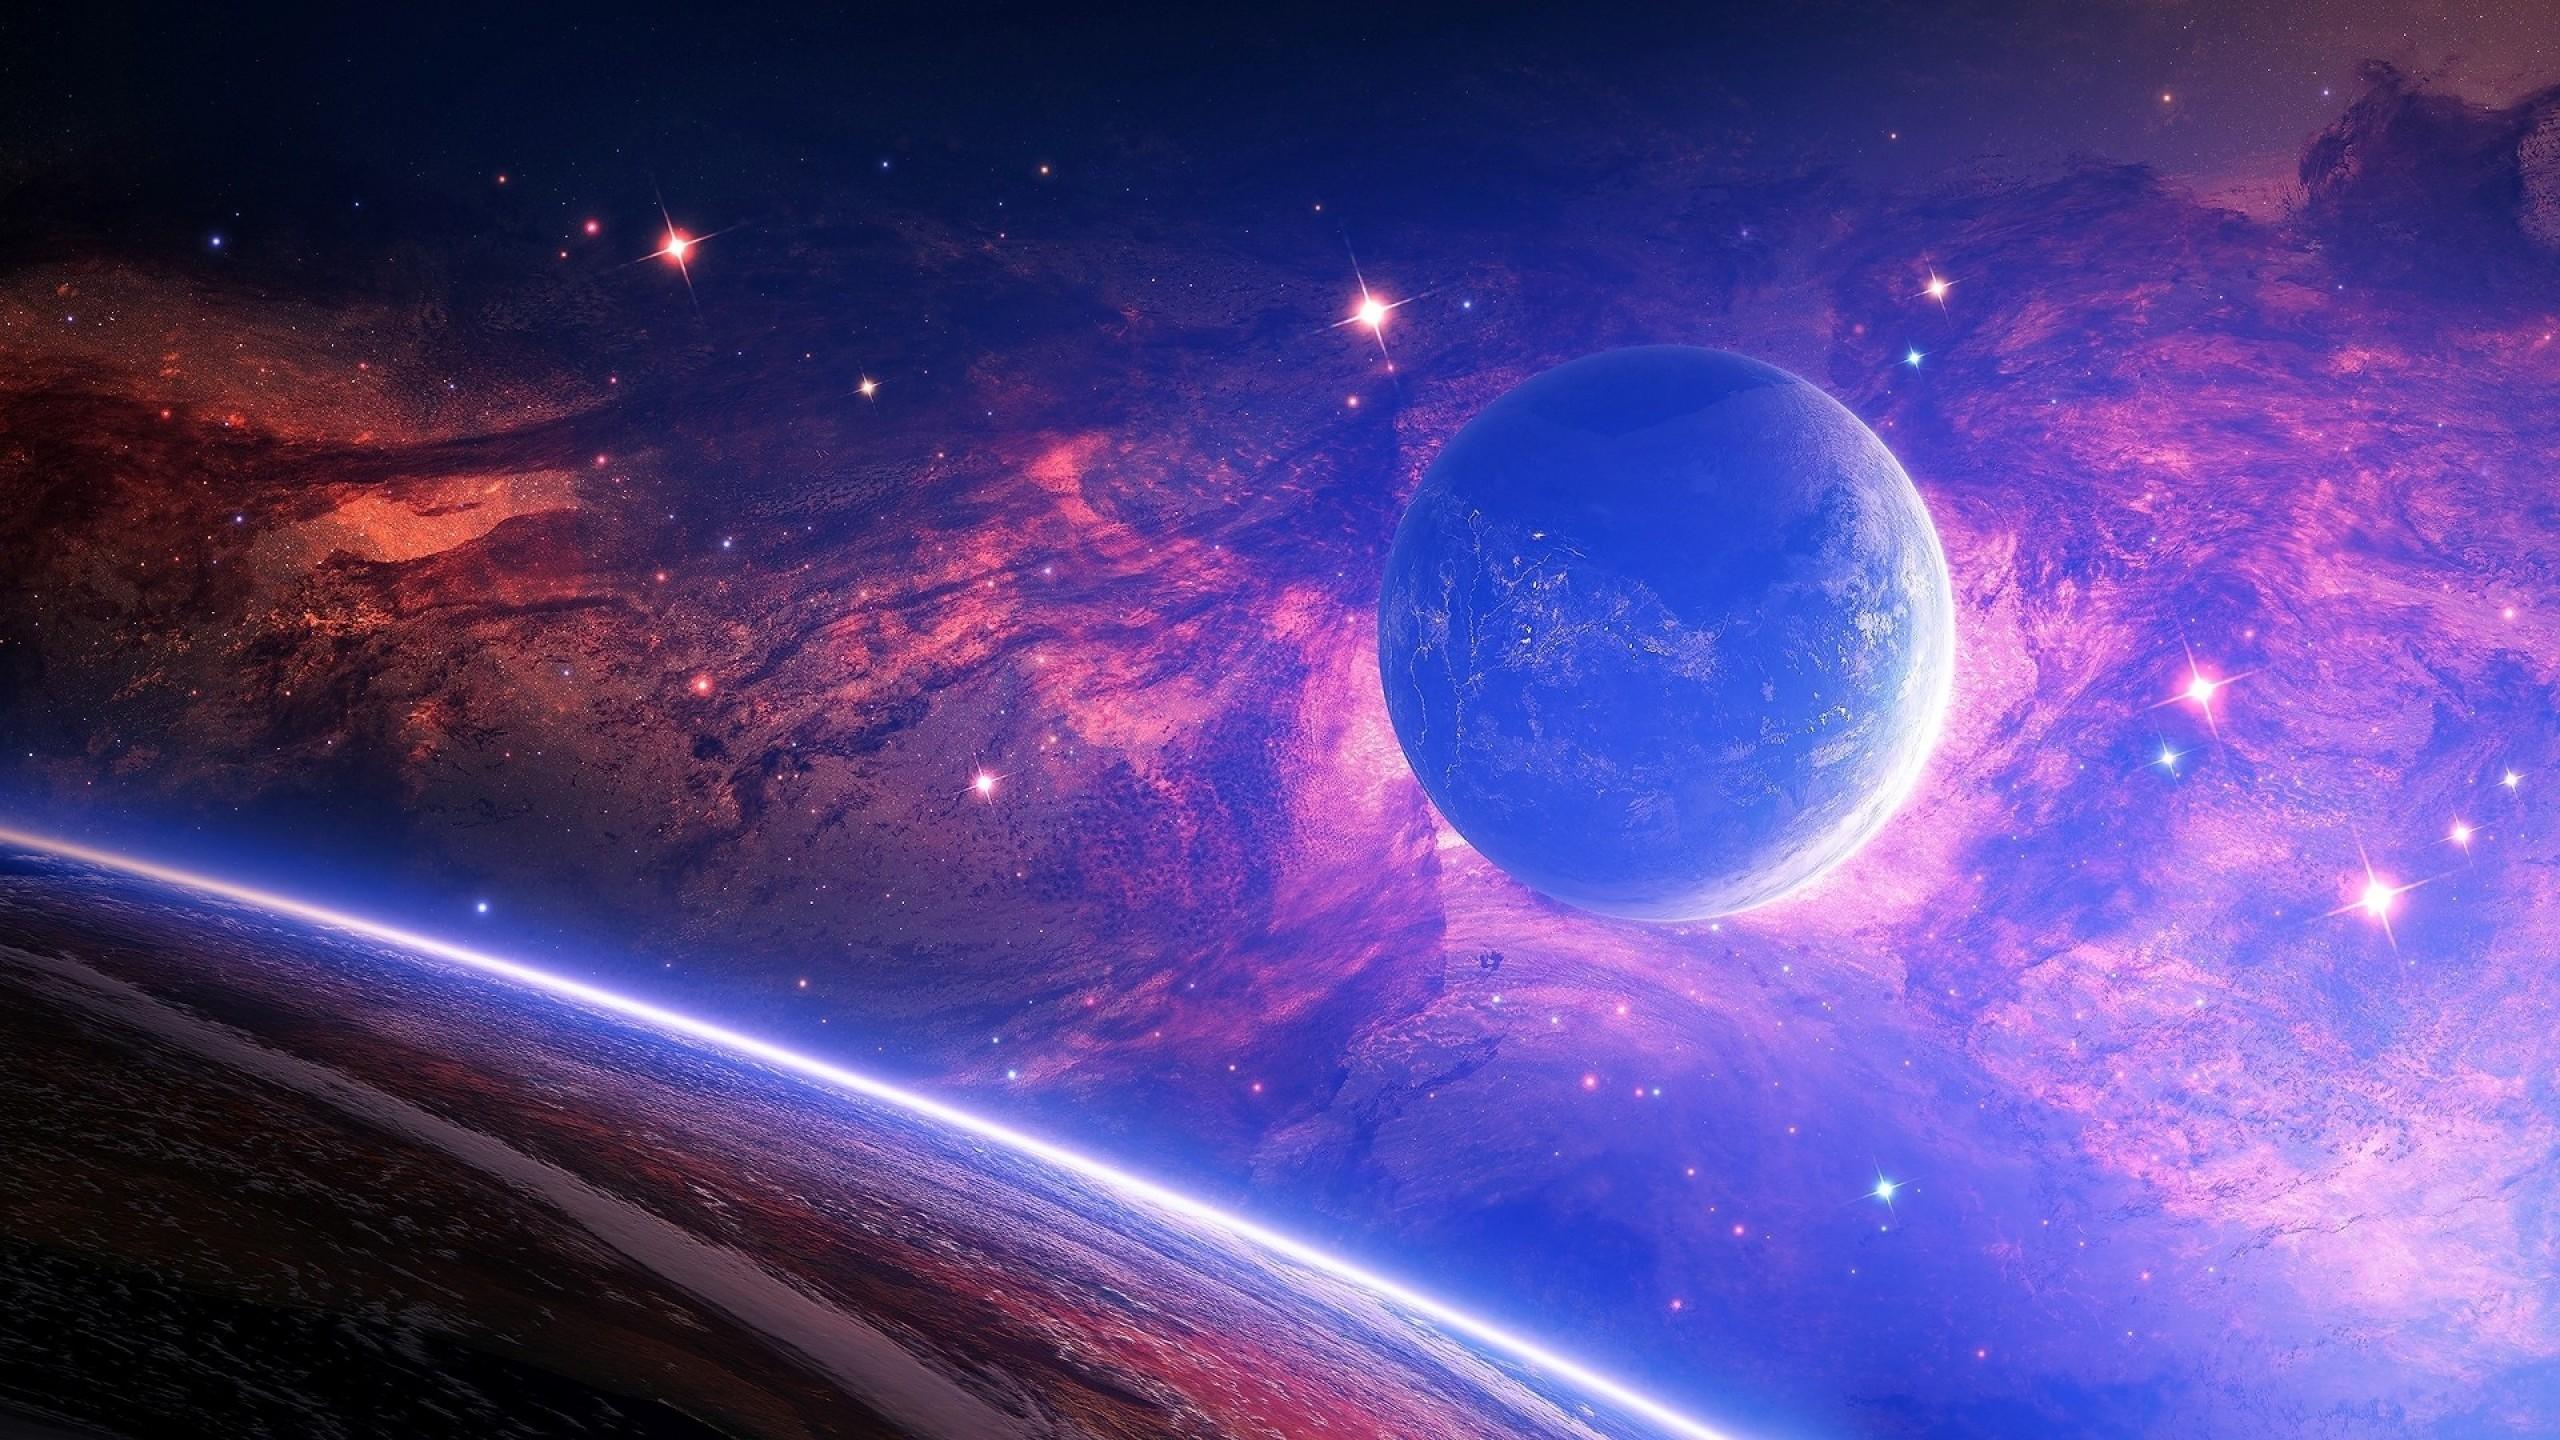 Wallpaper planet, light, spots, space